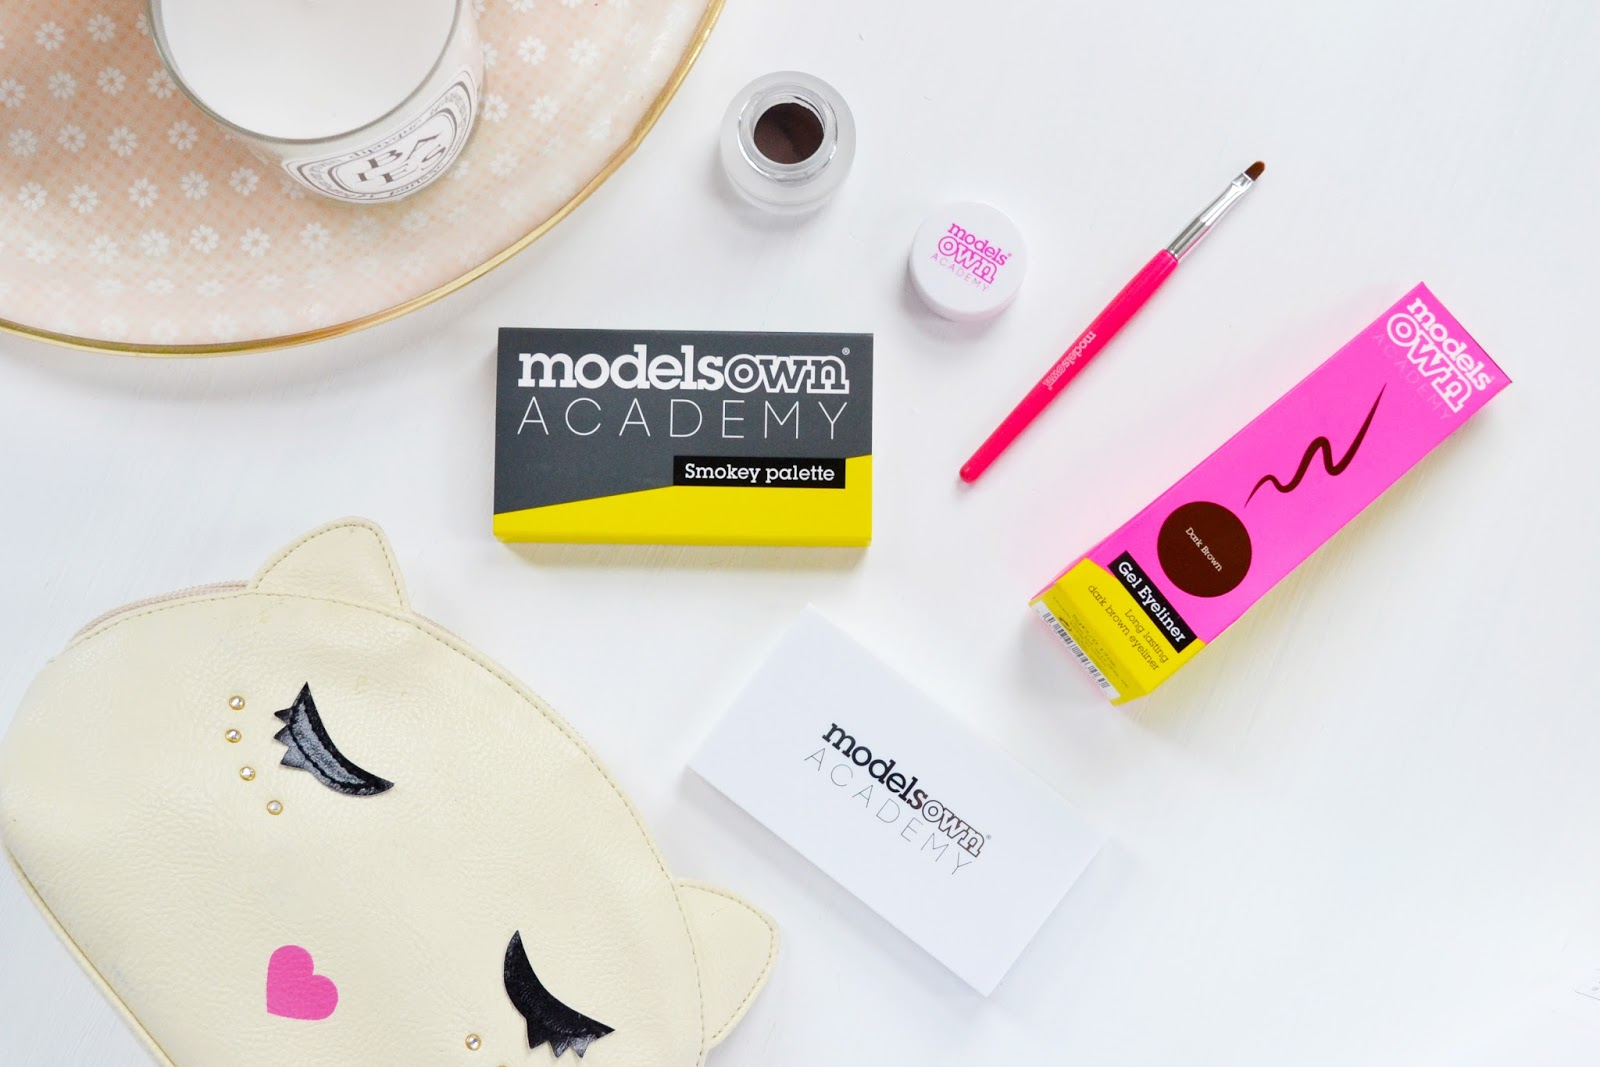 Eye make up from models own including smokey eye palette and gel eyeliner